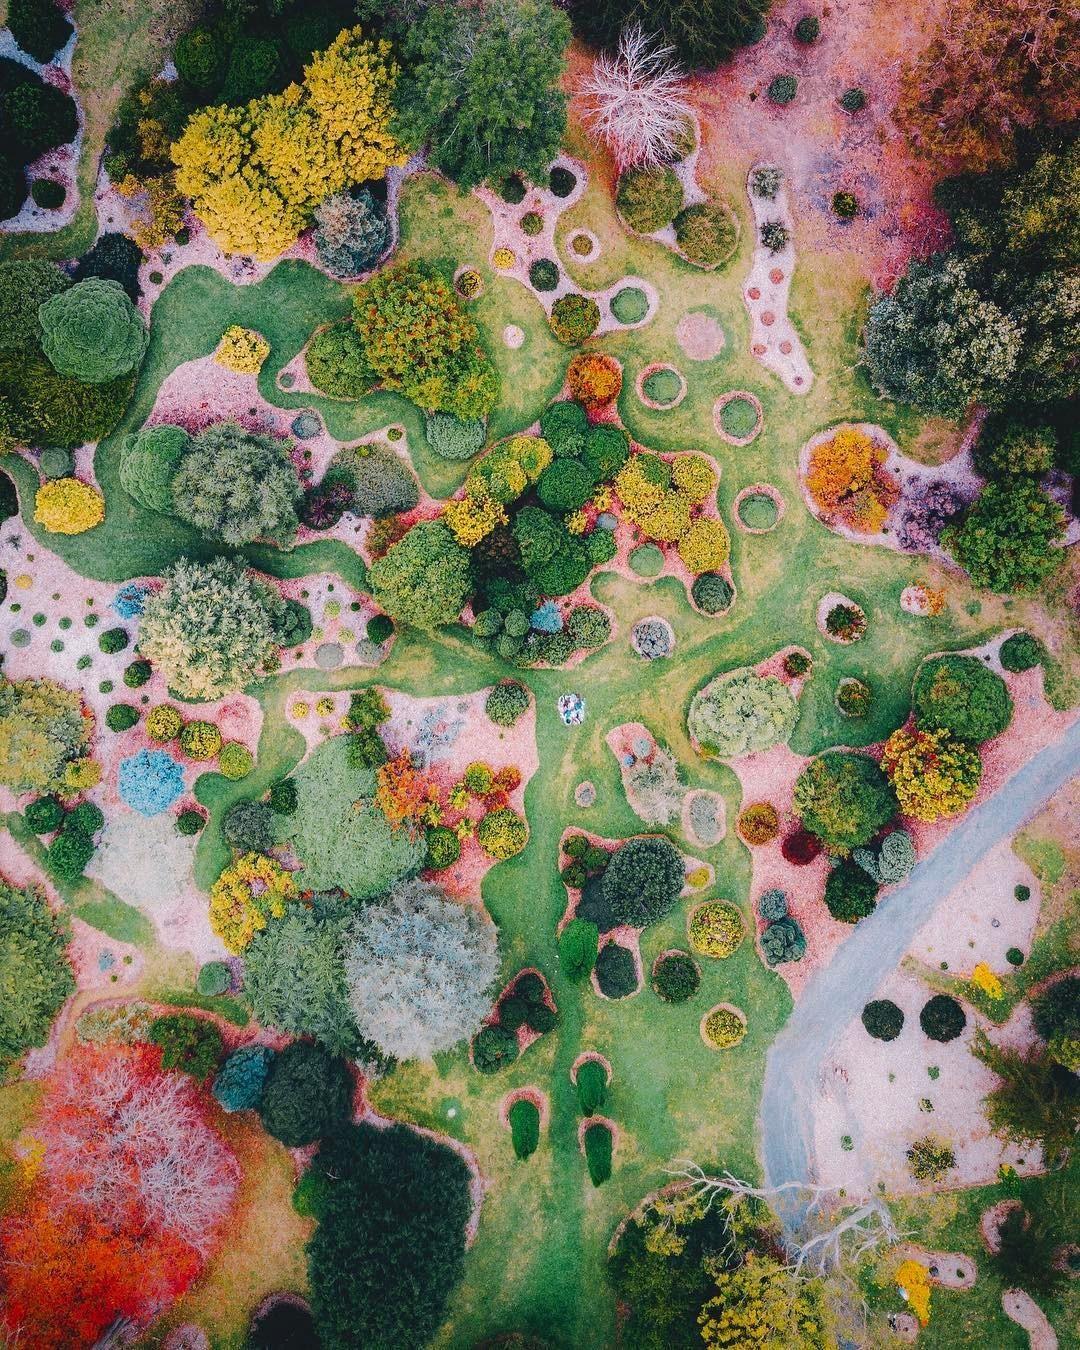 Landscape Image Australian Native Wall Art Fungi Photography Print Decor Landscape photograph Landscape Artwork